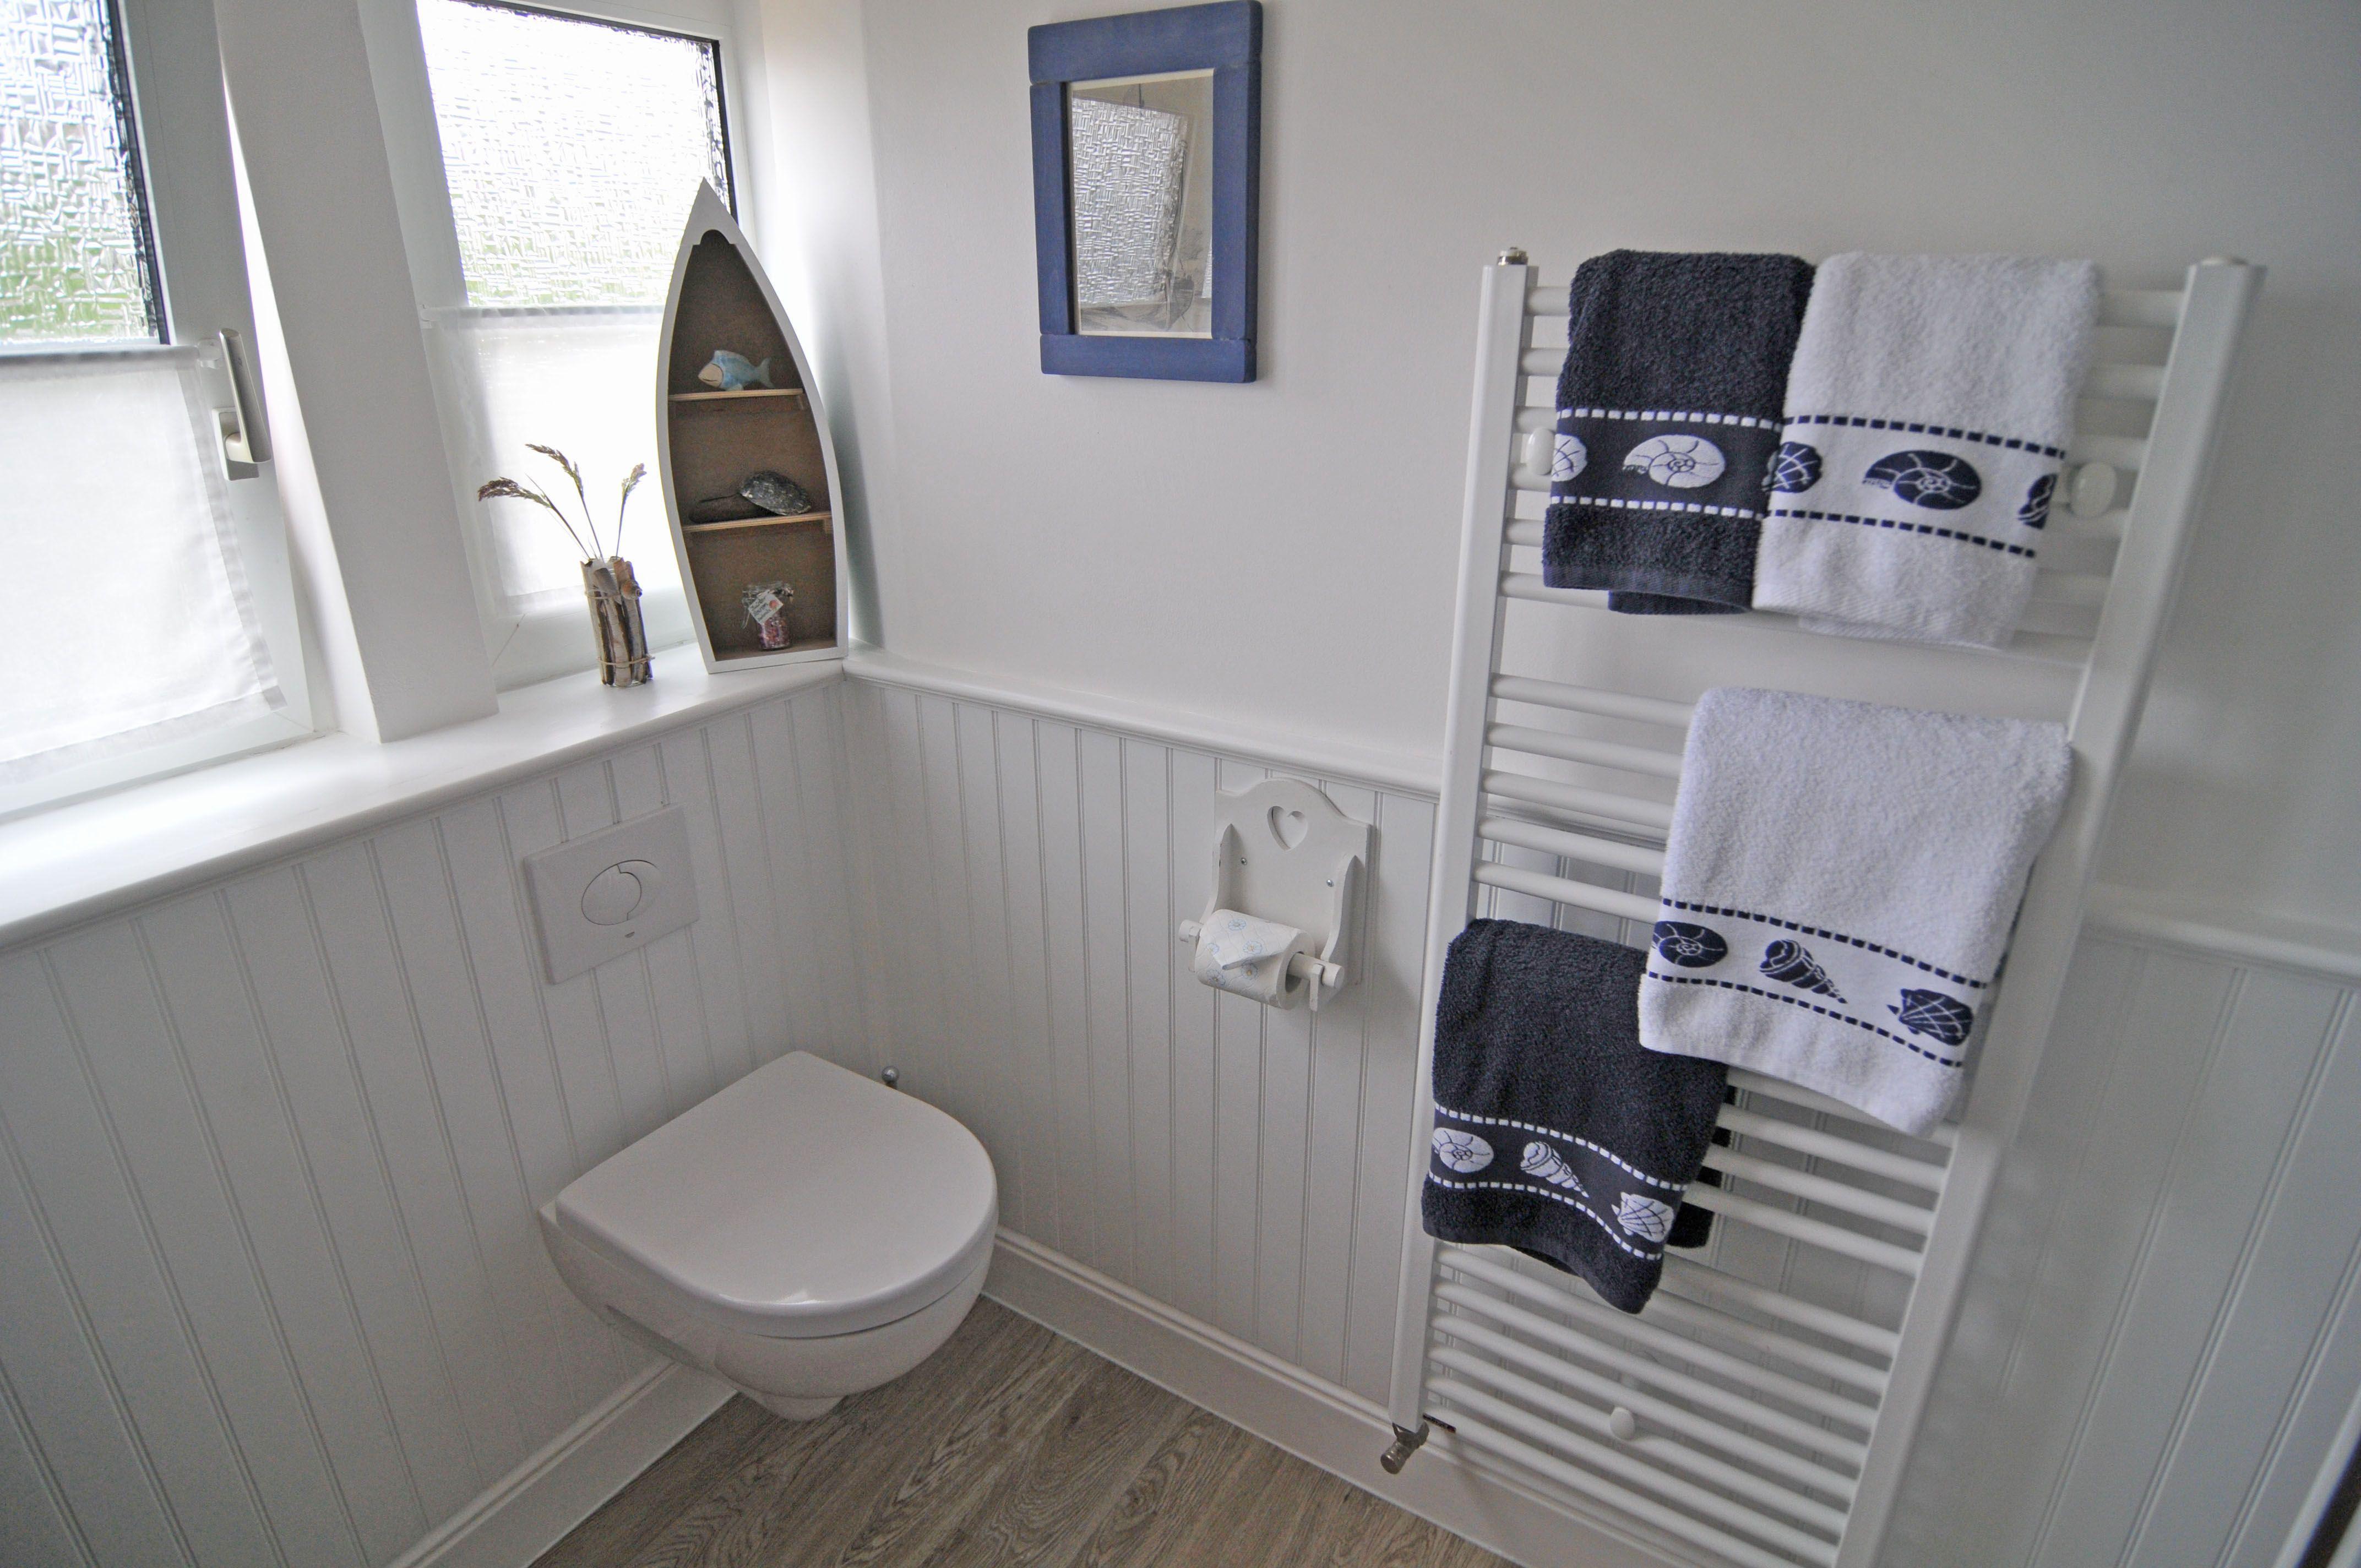 Beadboardde Badezimmer Wandverkleidung Diy Holzpaneele Selber